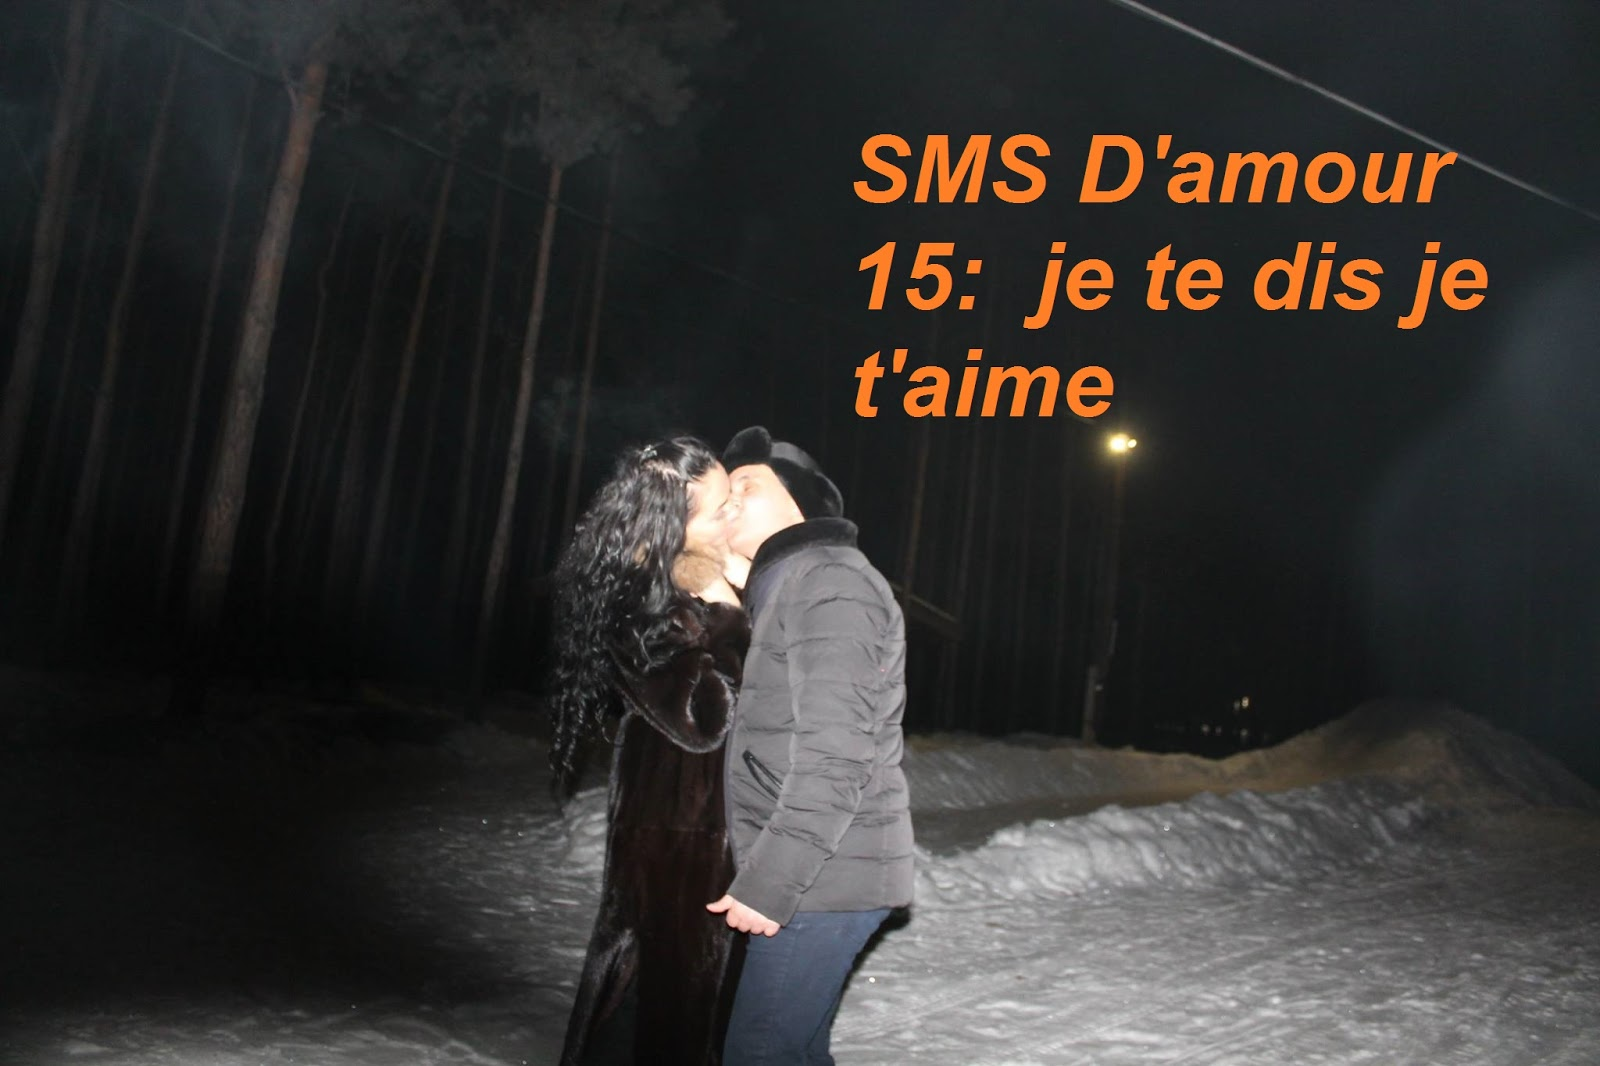 SMS D'amour 15  je te dis je t'aime